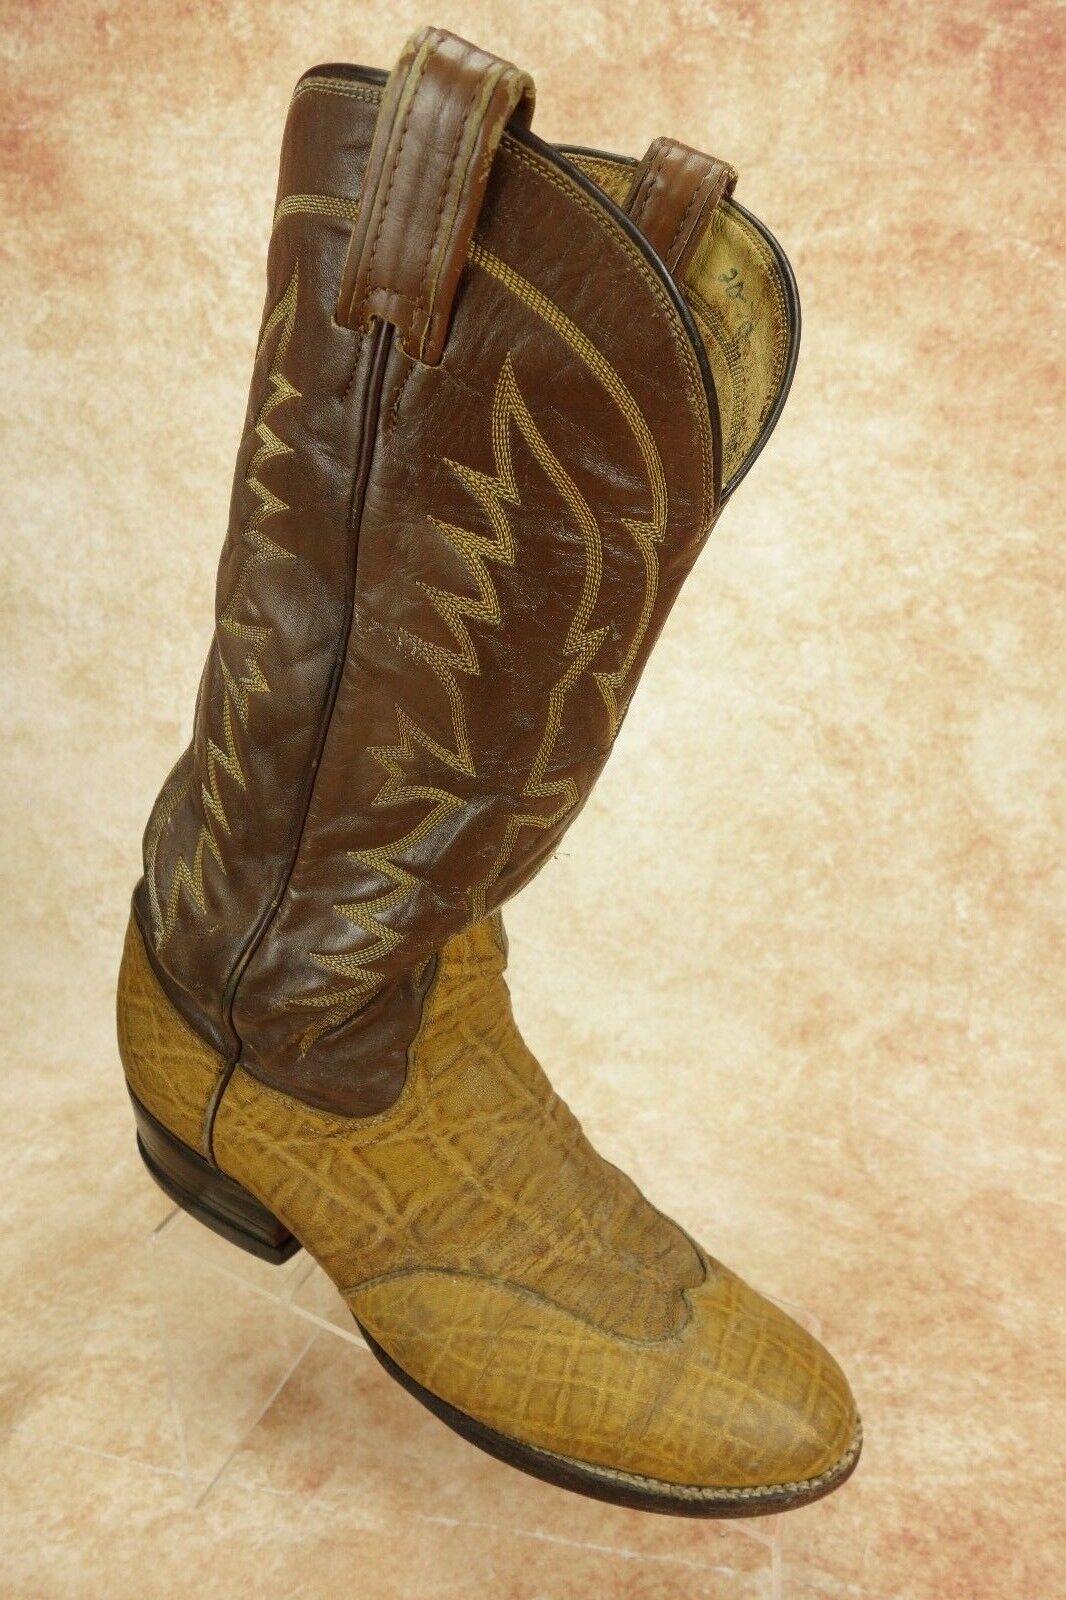 VTG Toney Lama Black Label Honey Brown Wingtip Elephant Print Cowboy Boots 9B